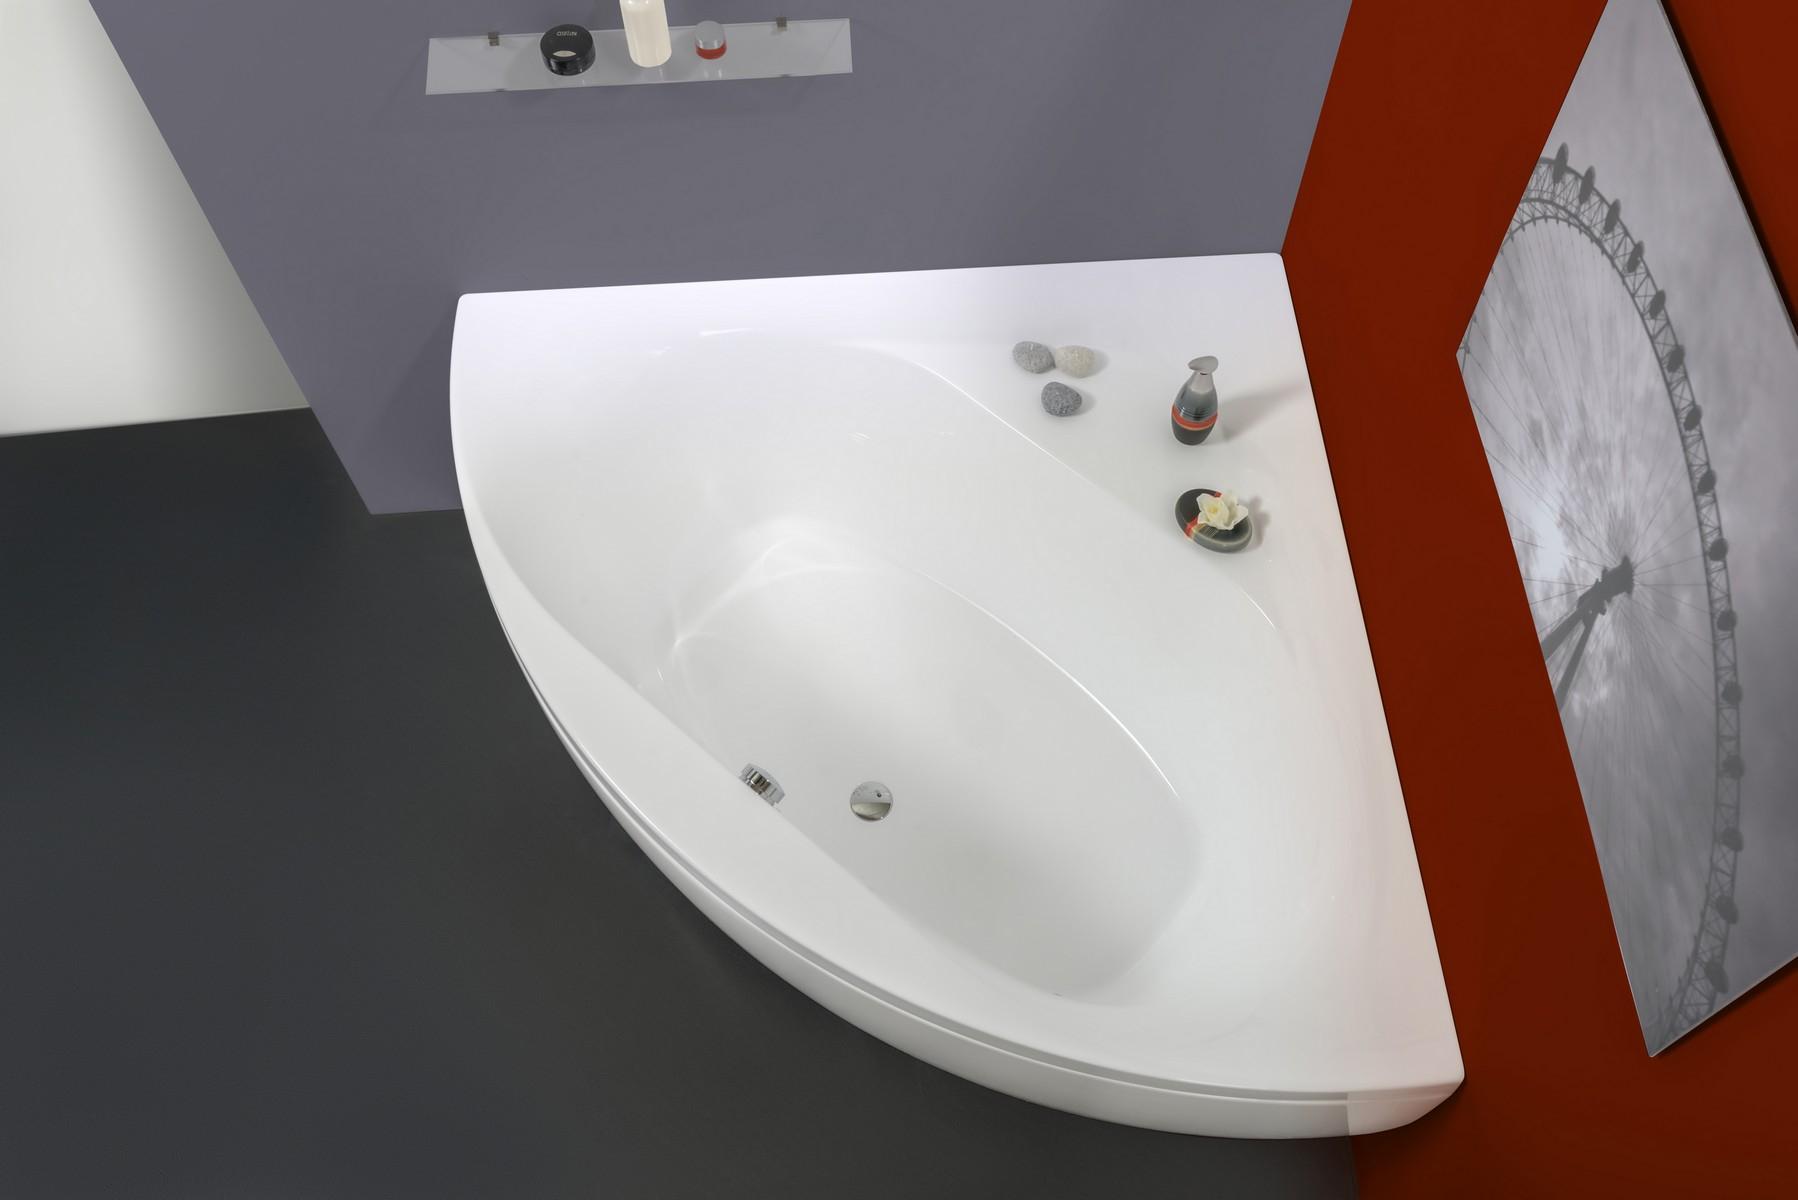 Aquatica Olivia Wht Small Corner Acrylic Bathtub within proportions 1798 X 1200